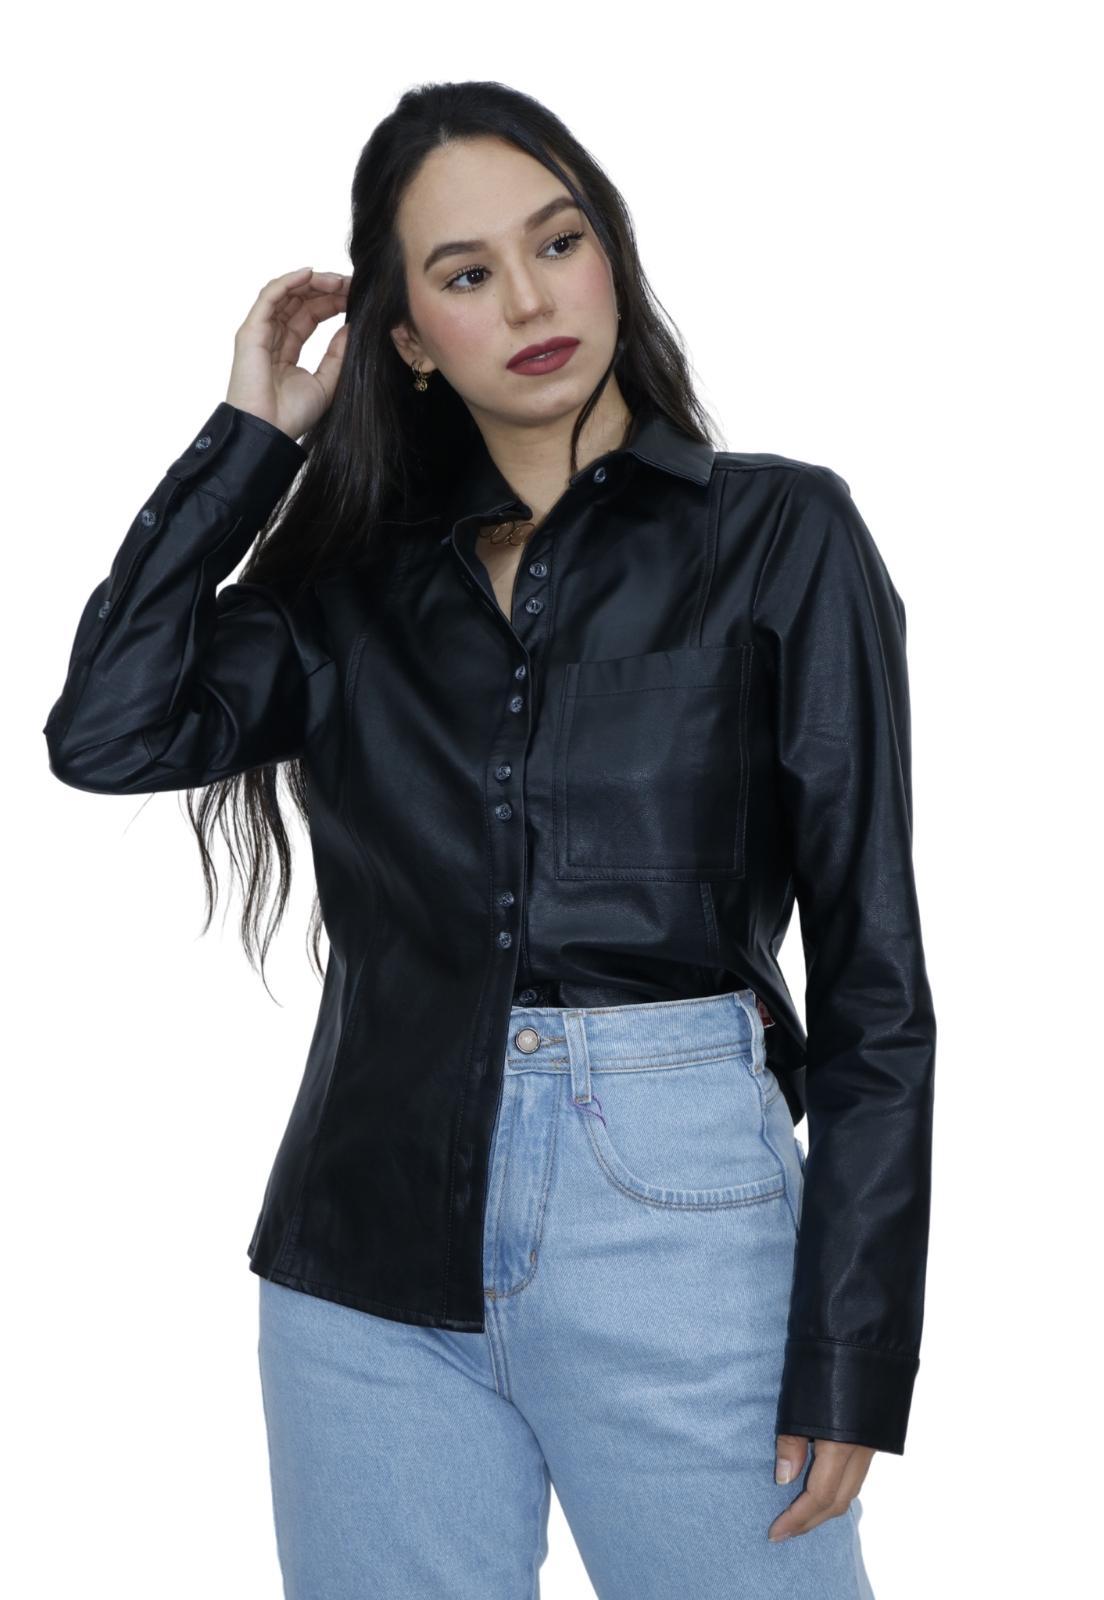 Camisa Feminina Manga Longa Material Sintético PU Bolso